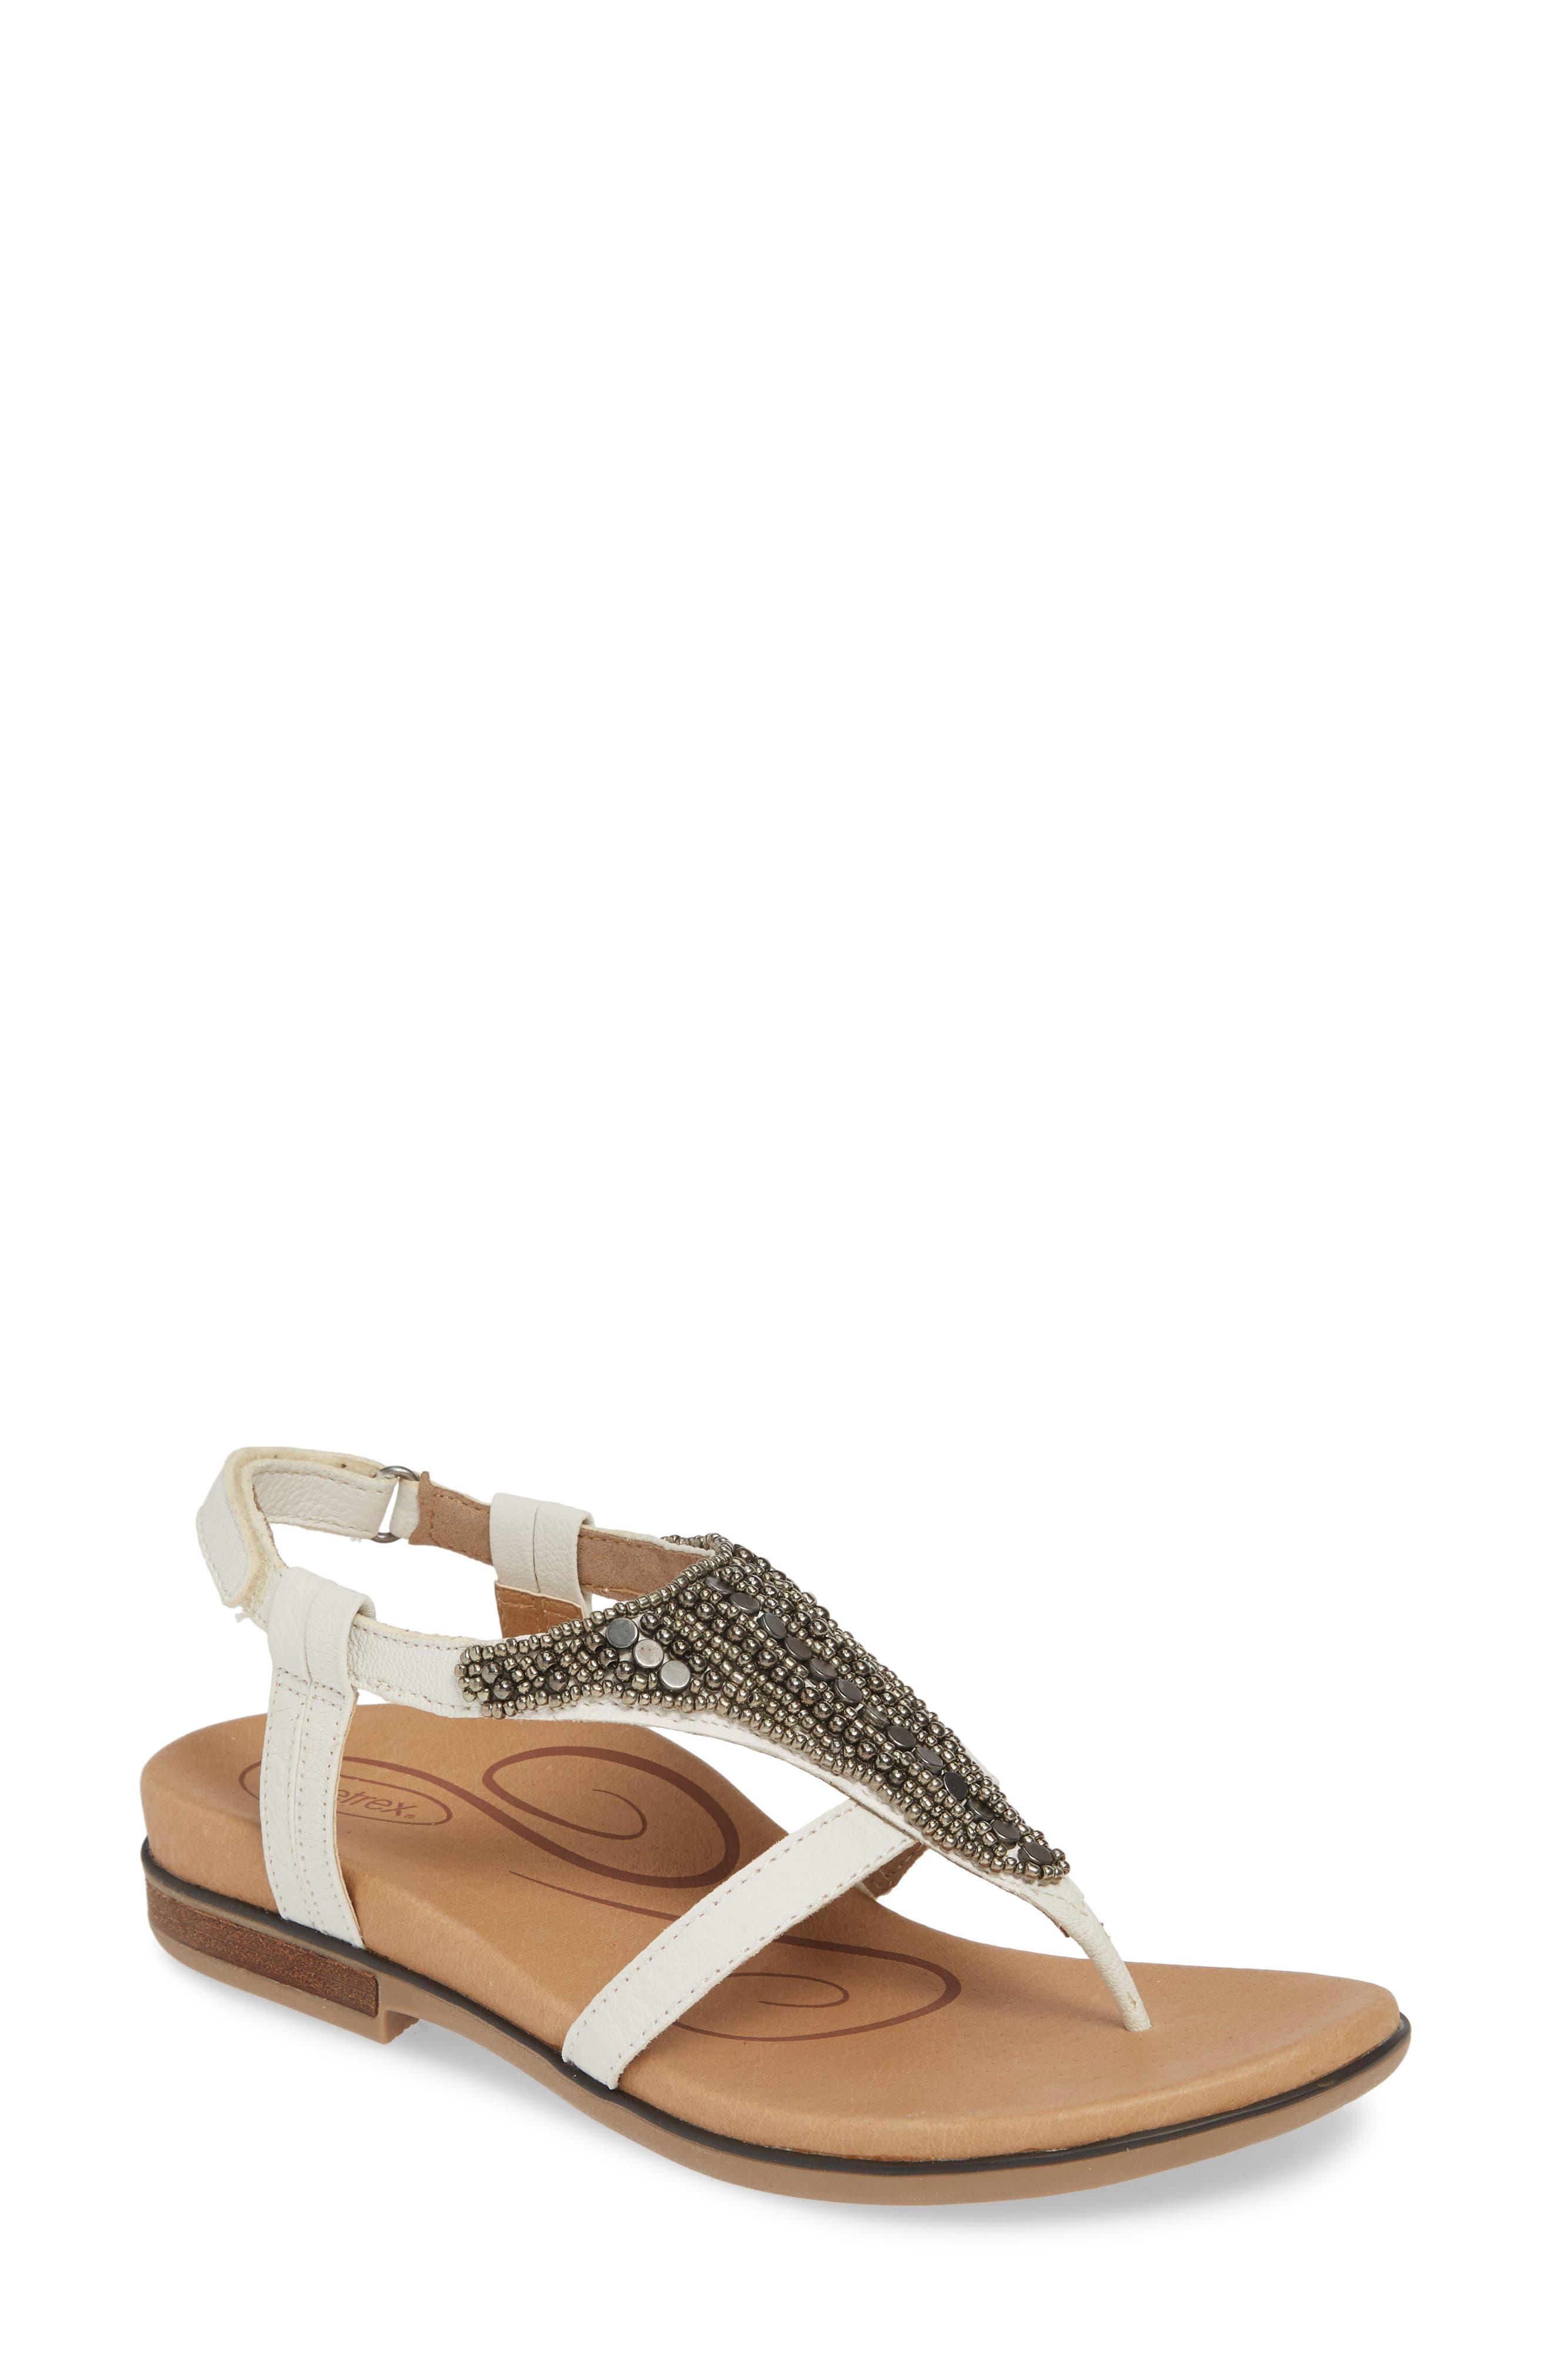 AETREX, Sheila Embellished Sandal, Main thumbnail 1, color, WHITE LEATHER